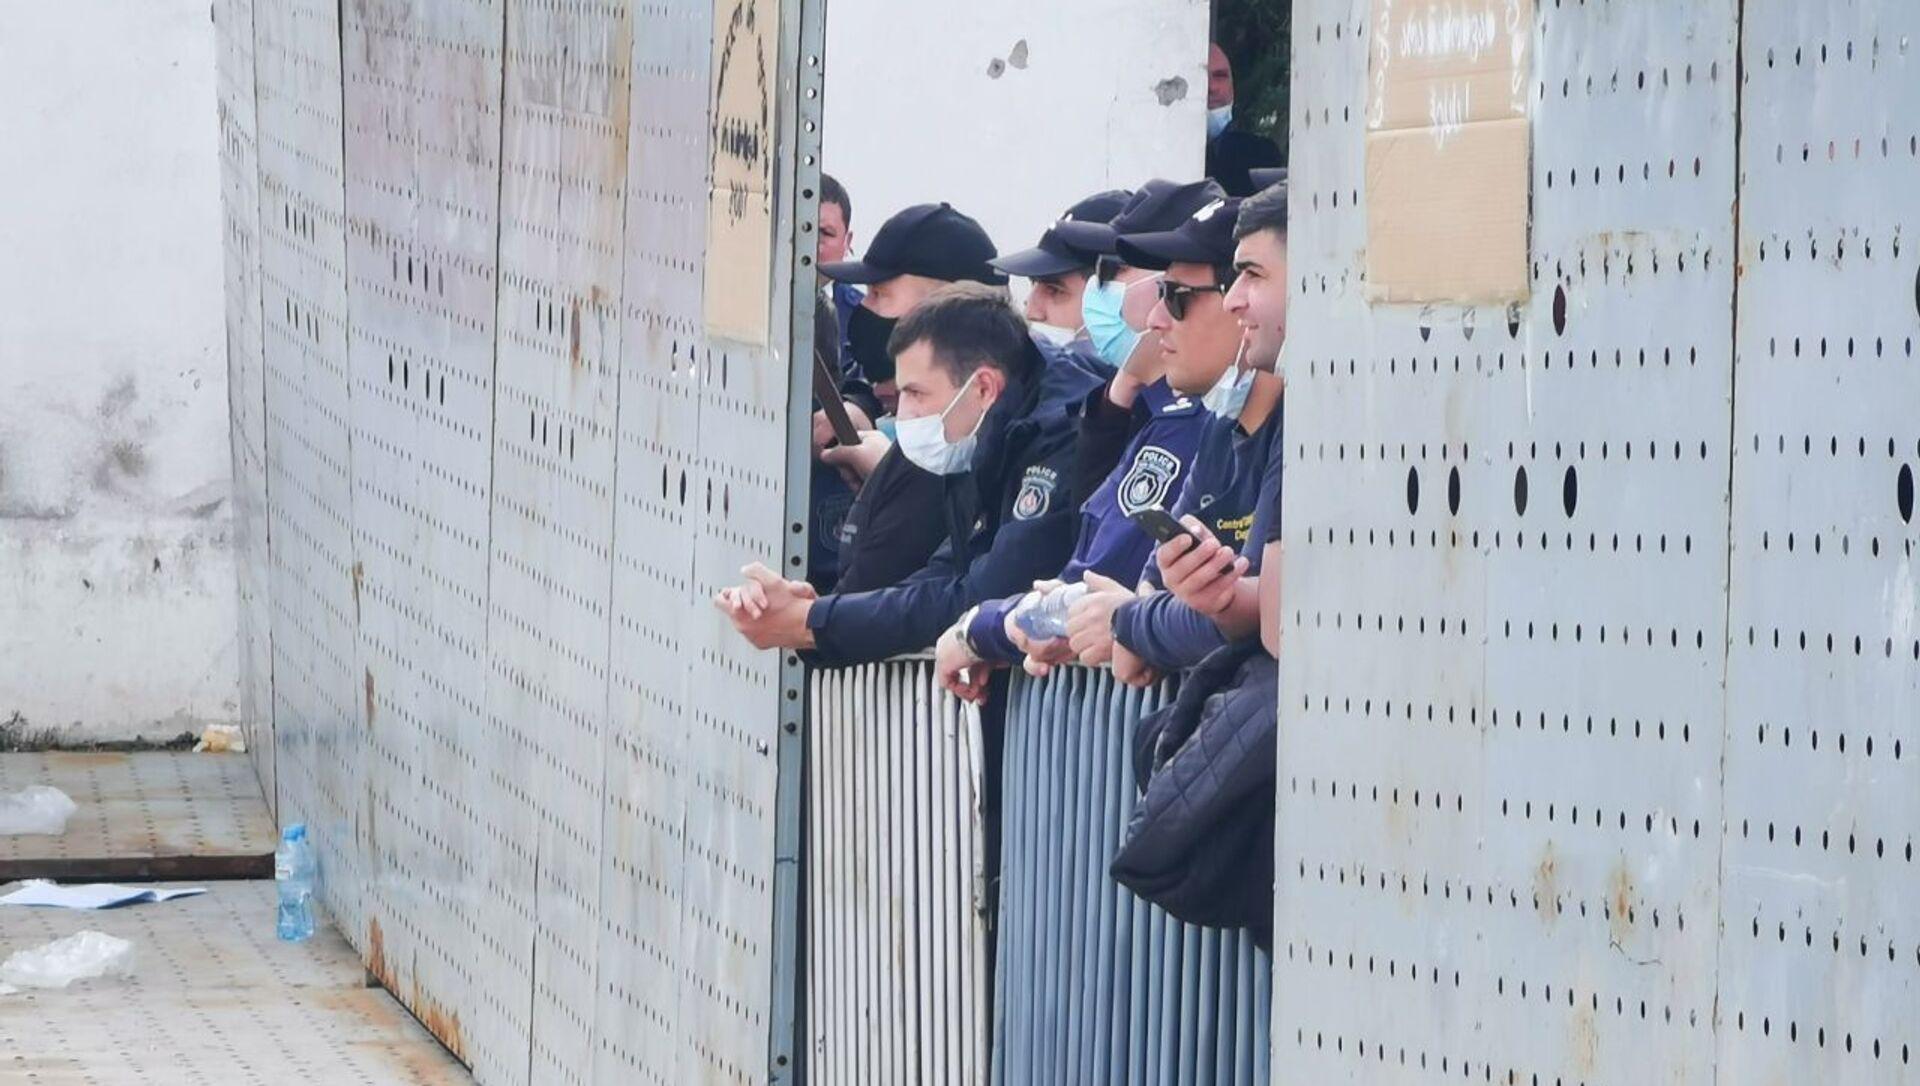 Полиция и охрана объекта. Акция протеста против строительства Намахвани ГЭС 15 апреля 2021 года - Sputnik Грузия, 1920, 26.05.2021